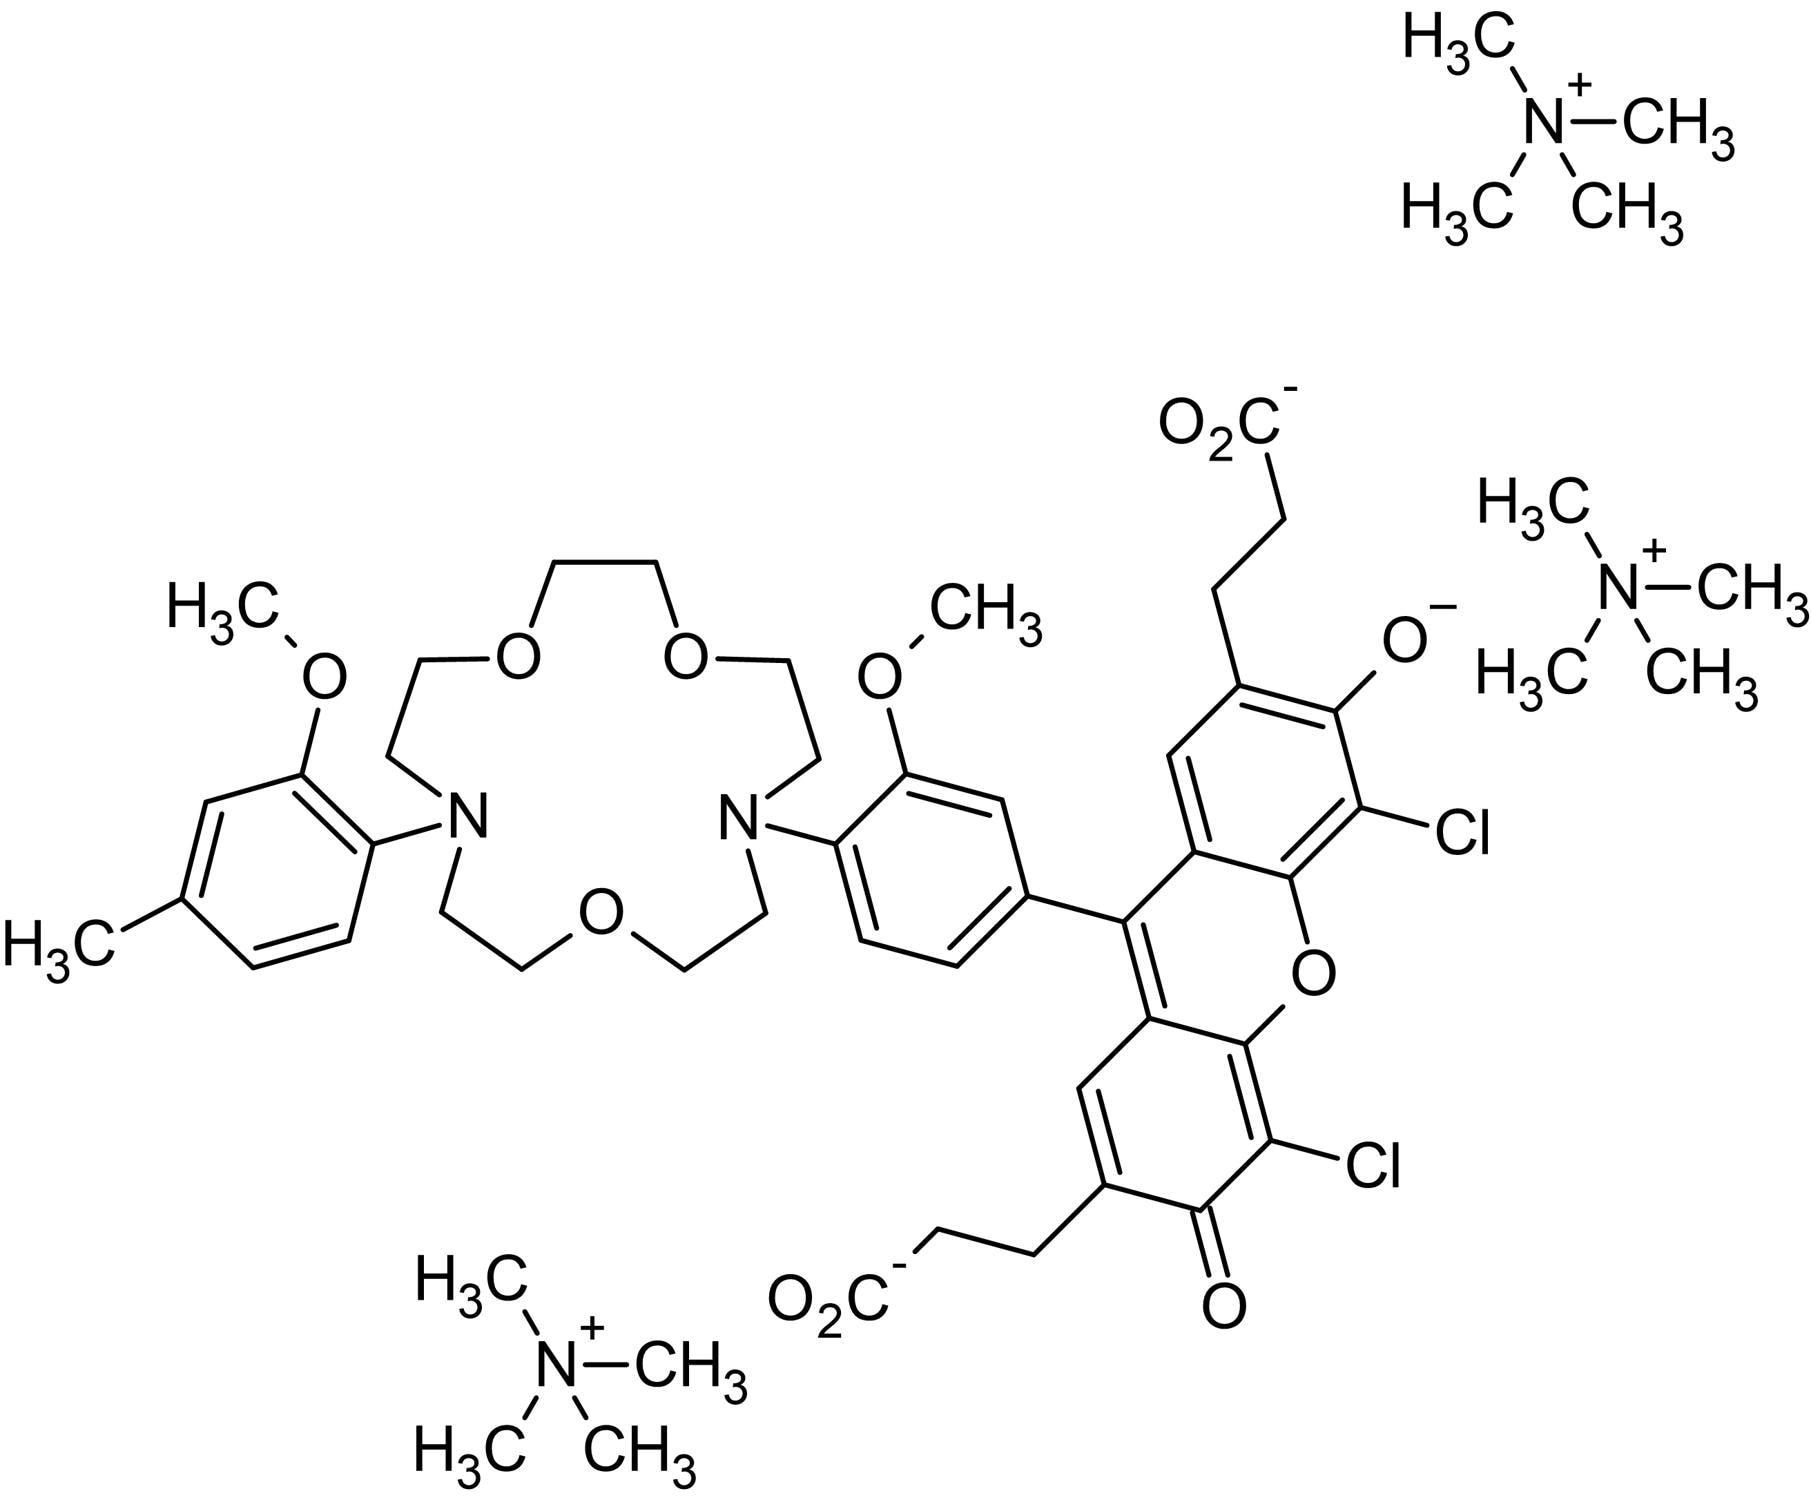 Chemical Structure - ION NaTRIUM Green&trade;-2 TMA+ Salt, cytosolic Na<sup>+</sup> indicator (ab142803)